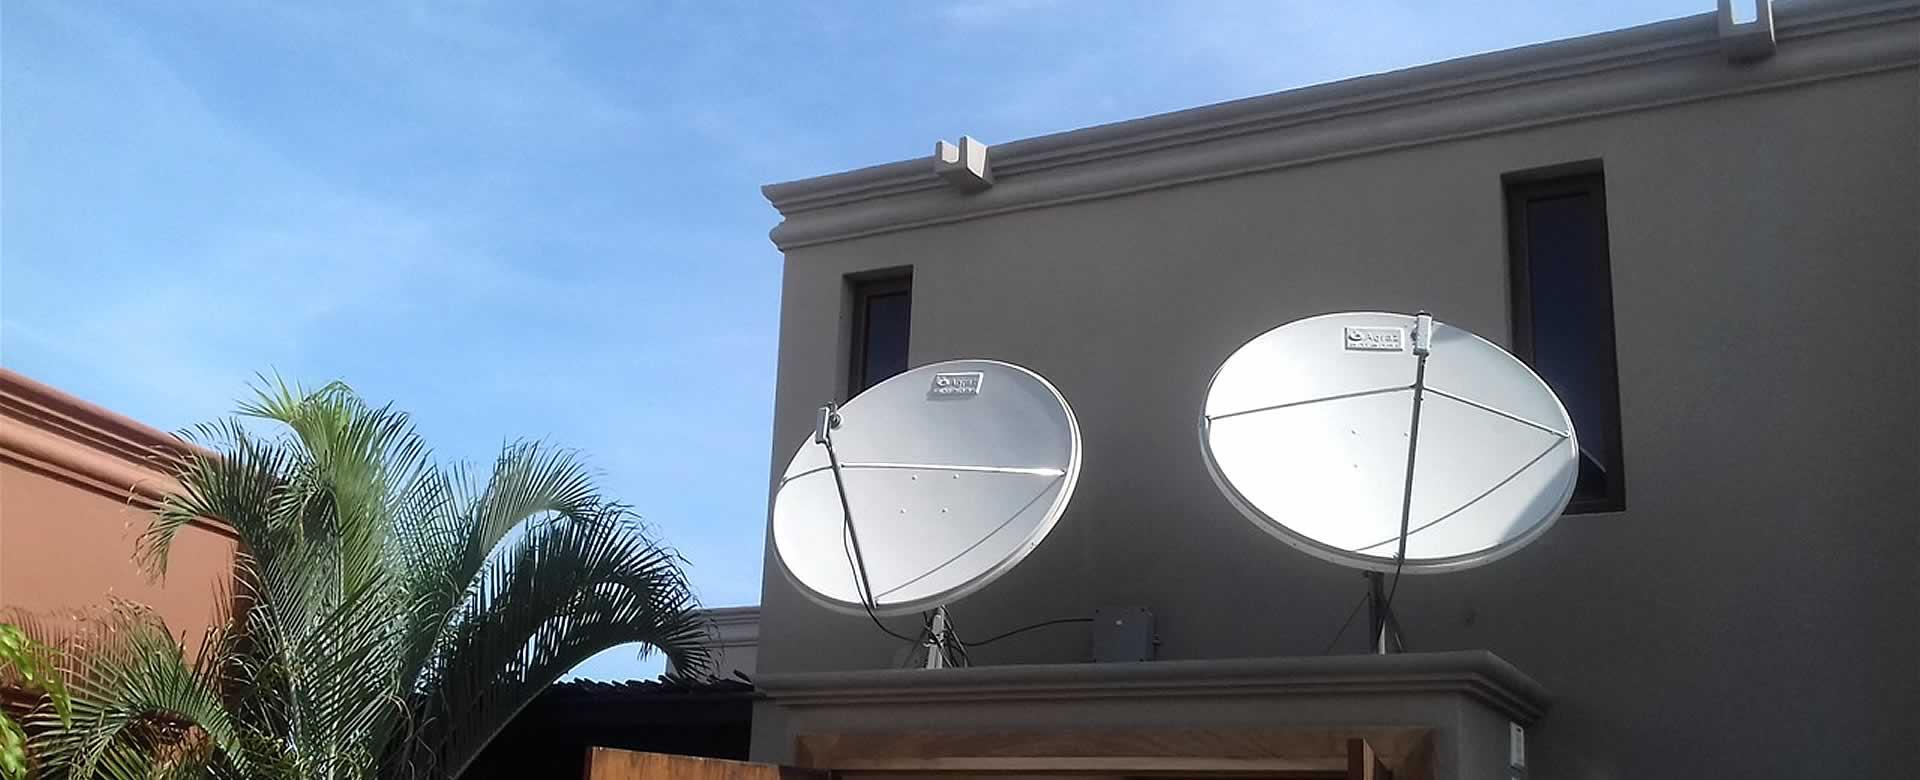 FiberTech Television Installations